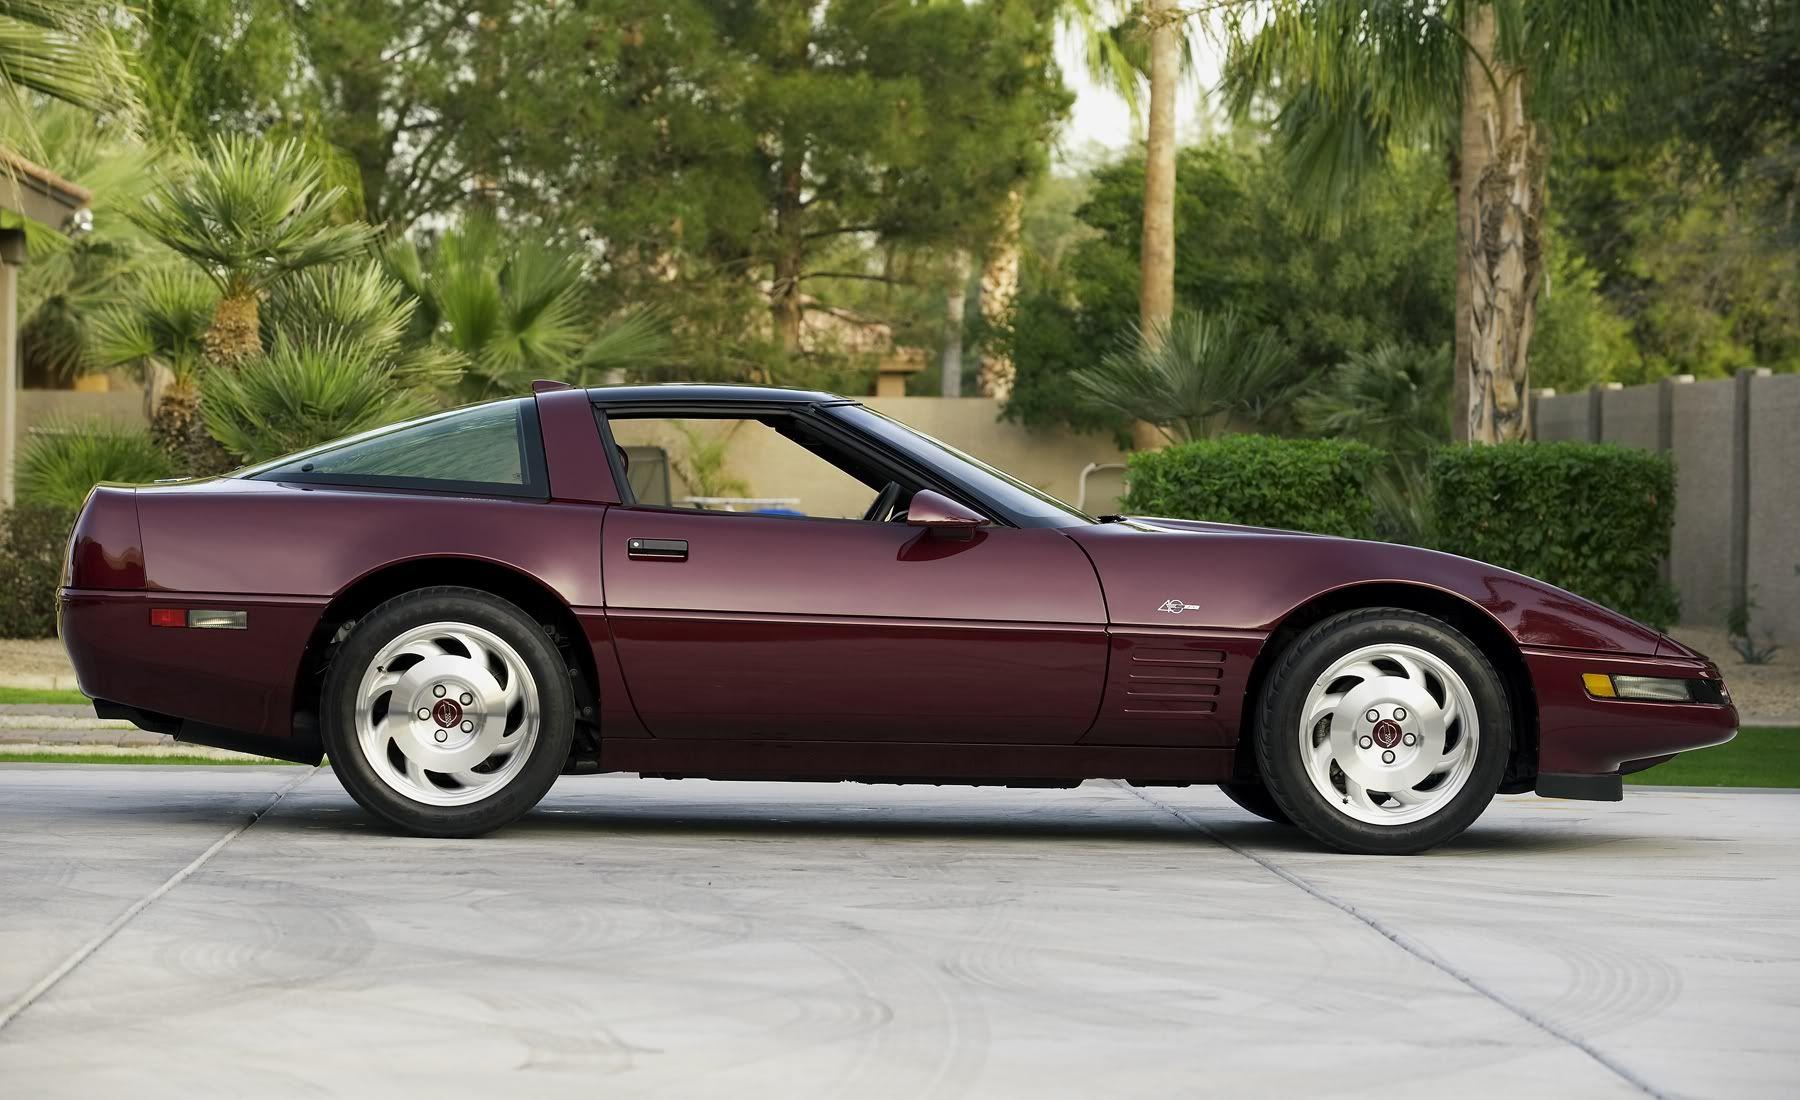 1993 40th Anniversary Corvette Corvette Action Center Corvette Forum Corvette Corvette Zr1 Corvette C4